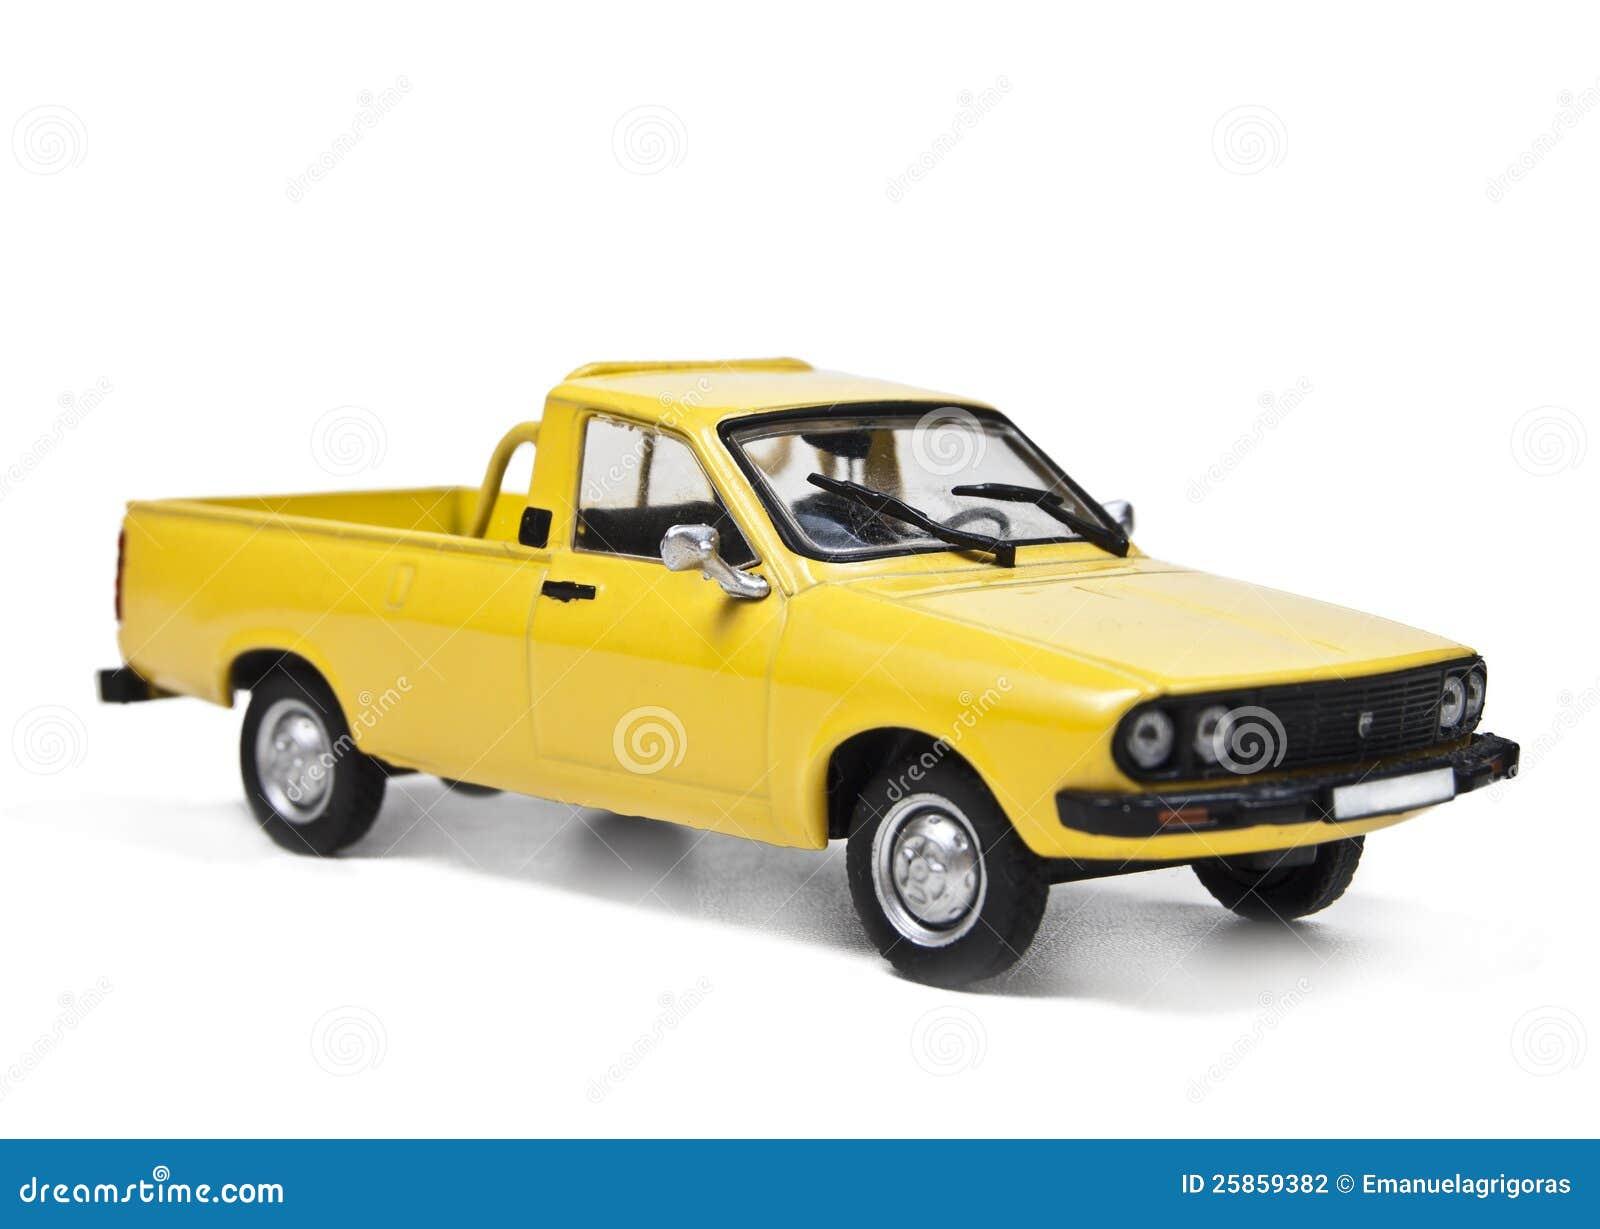 Dacia 1300 Pick Up Stock Photography Image 25859382